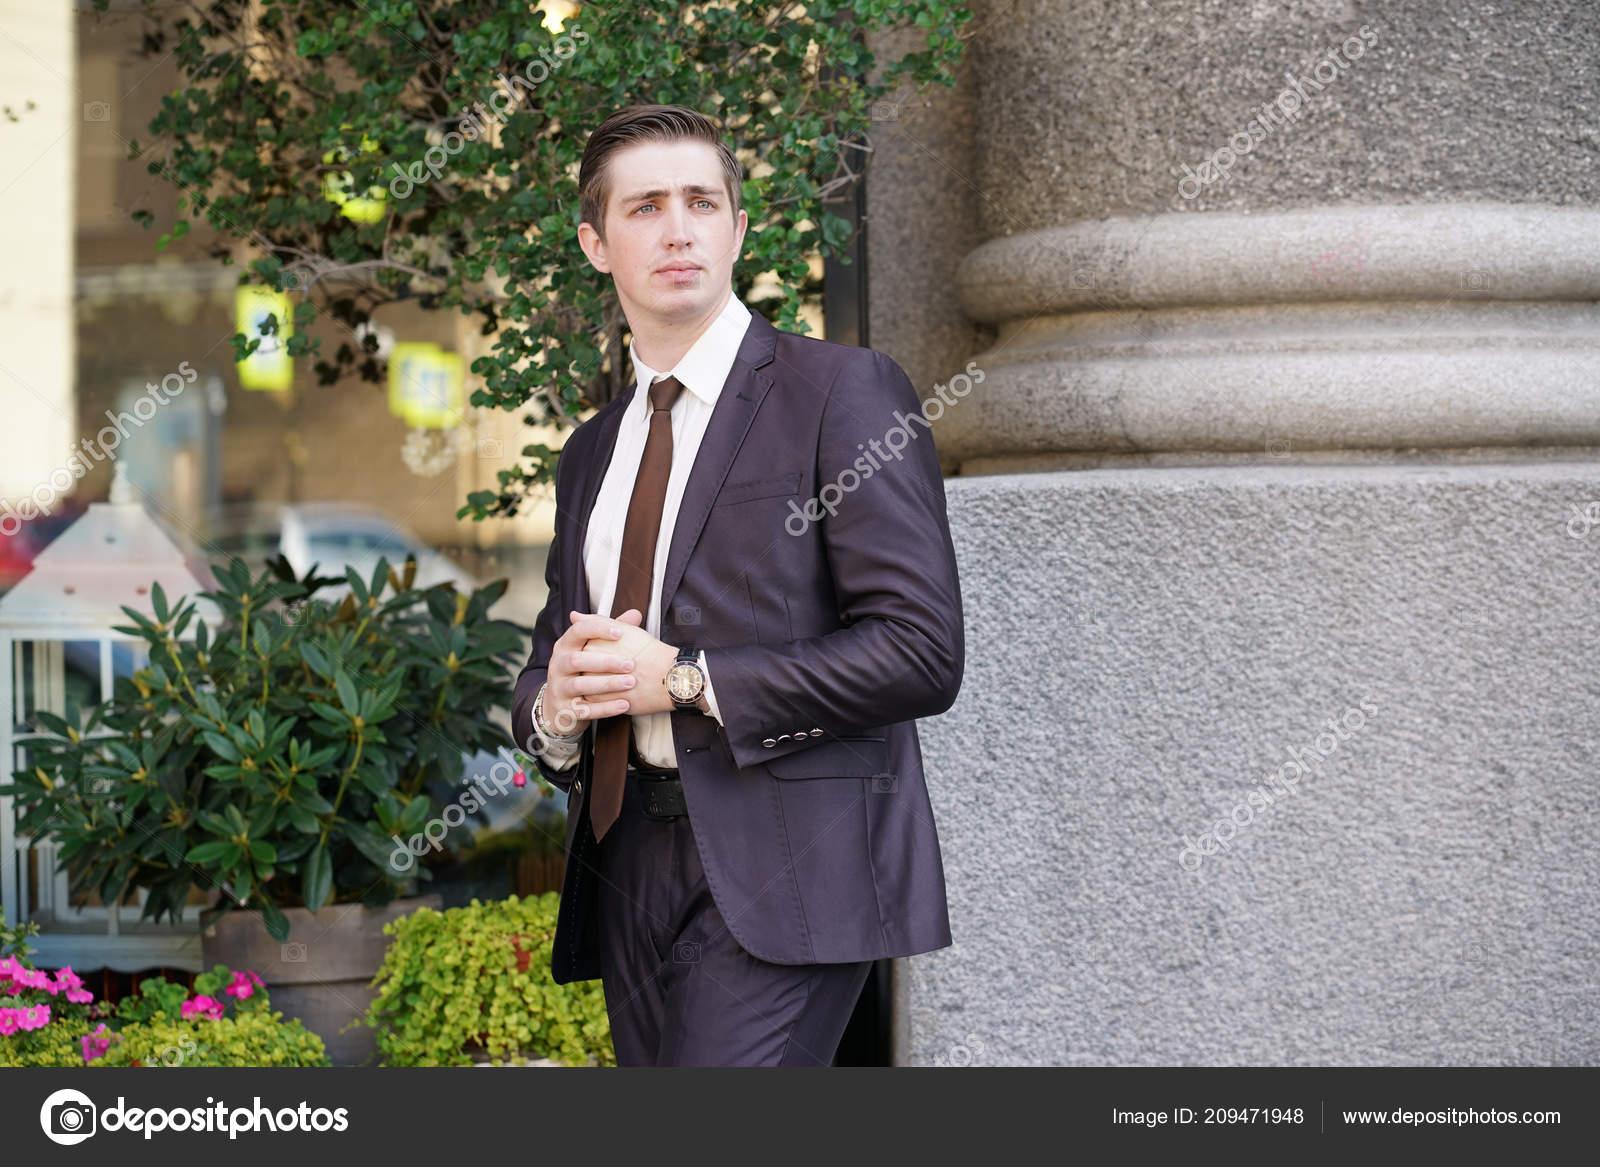 8e94c6b7558e Νεαρός Άνδρας Στο Μαύρο Επαγγελματικό Κοστούμι Λευκό Πουκάμισο Και ...